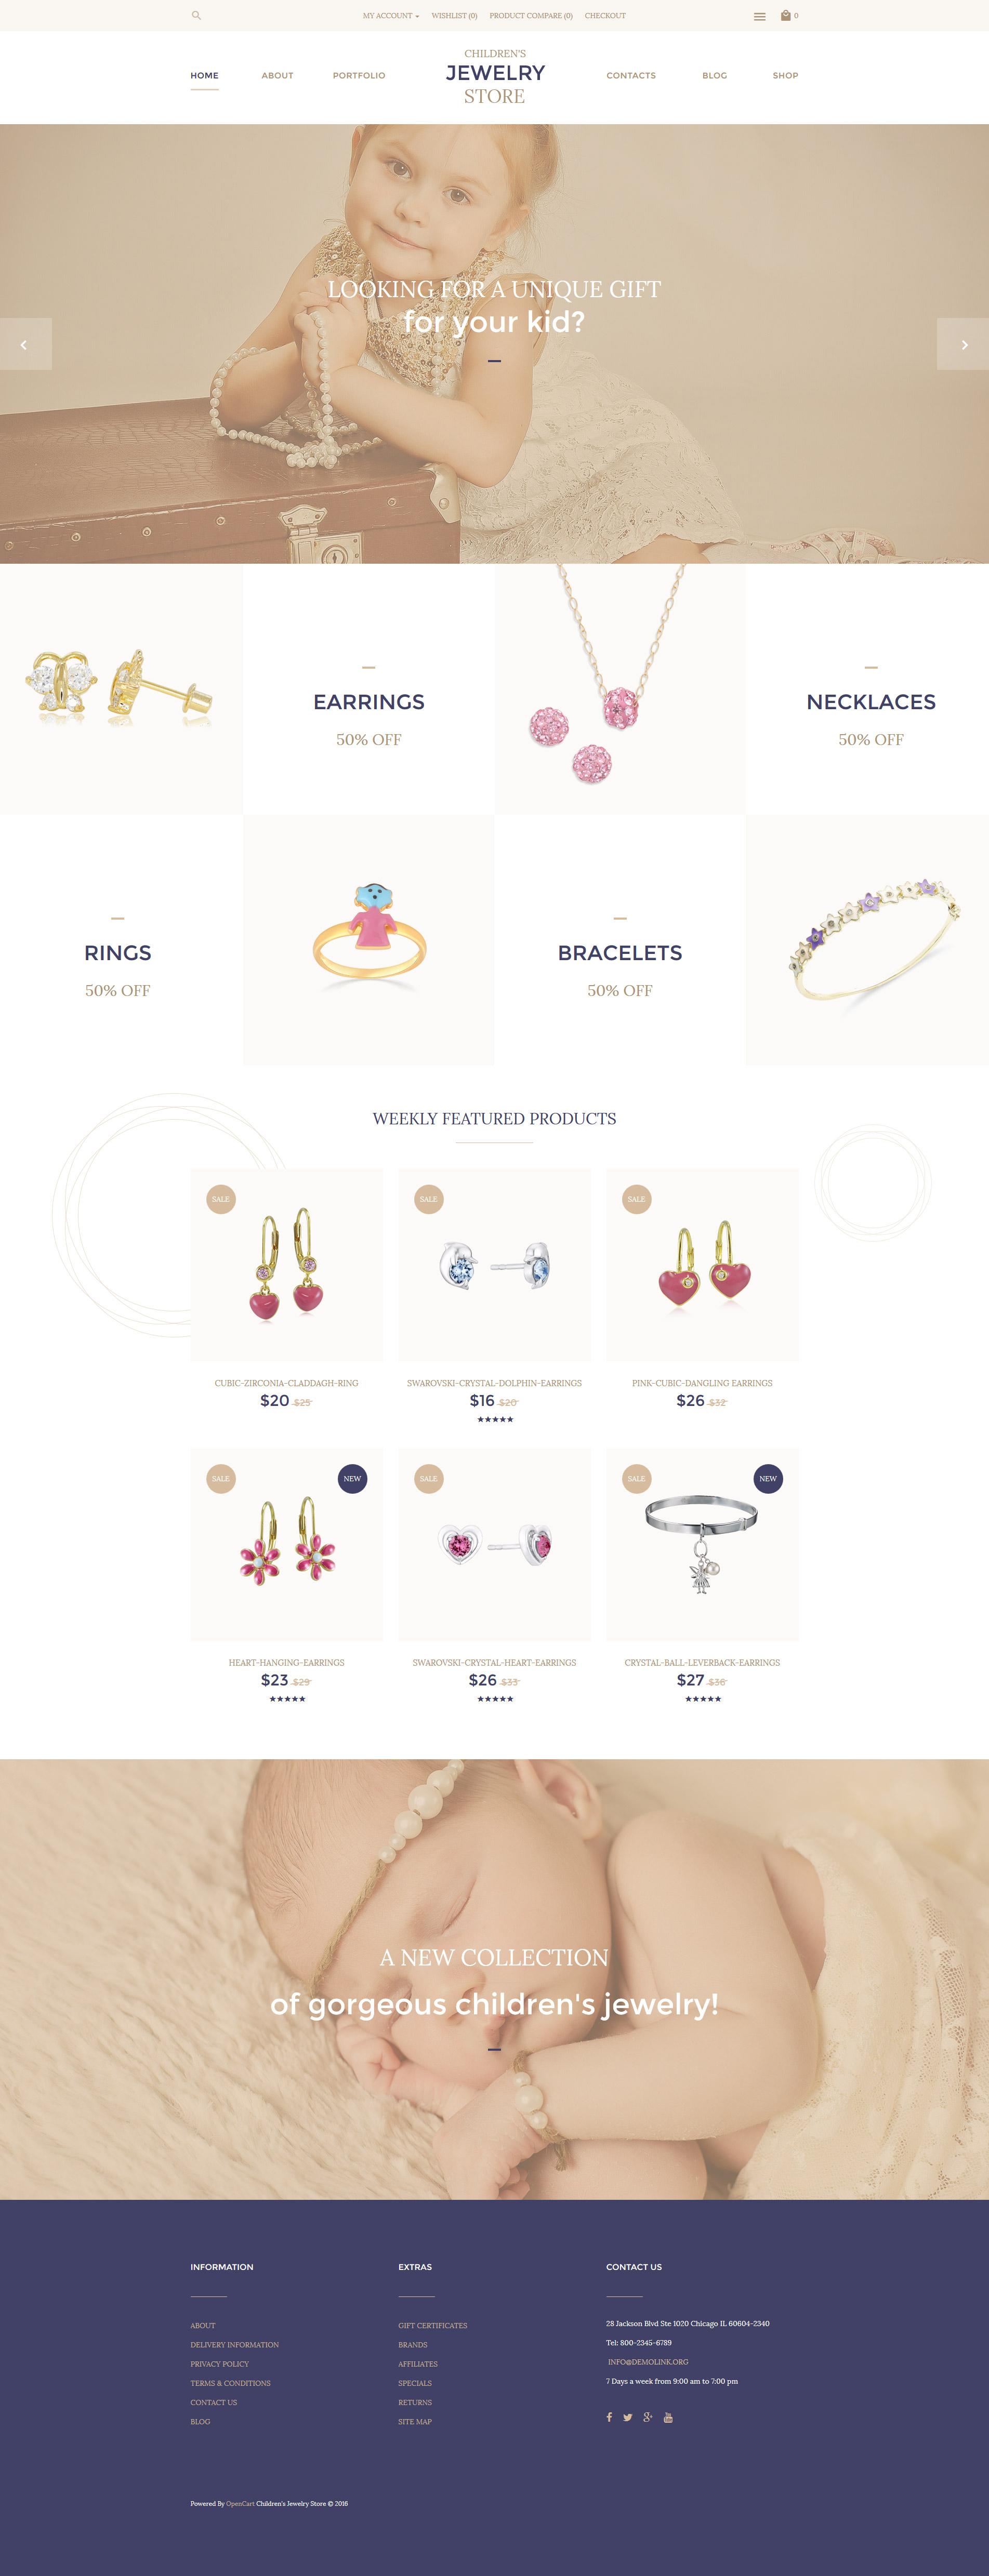 Reszponzív Children's Jewelry Store OpenCart sablon 57739